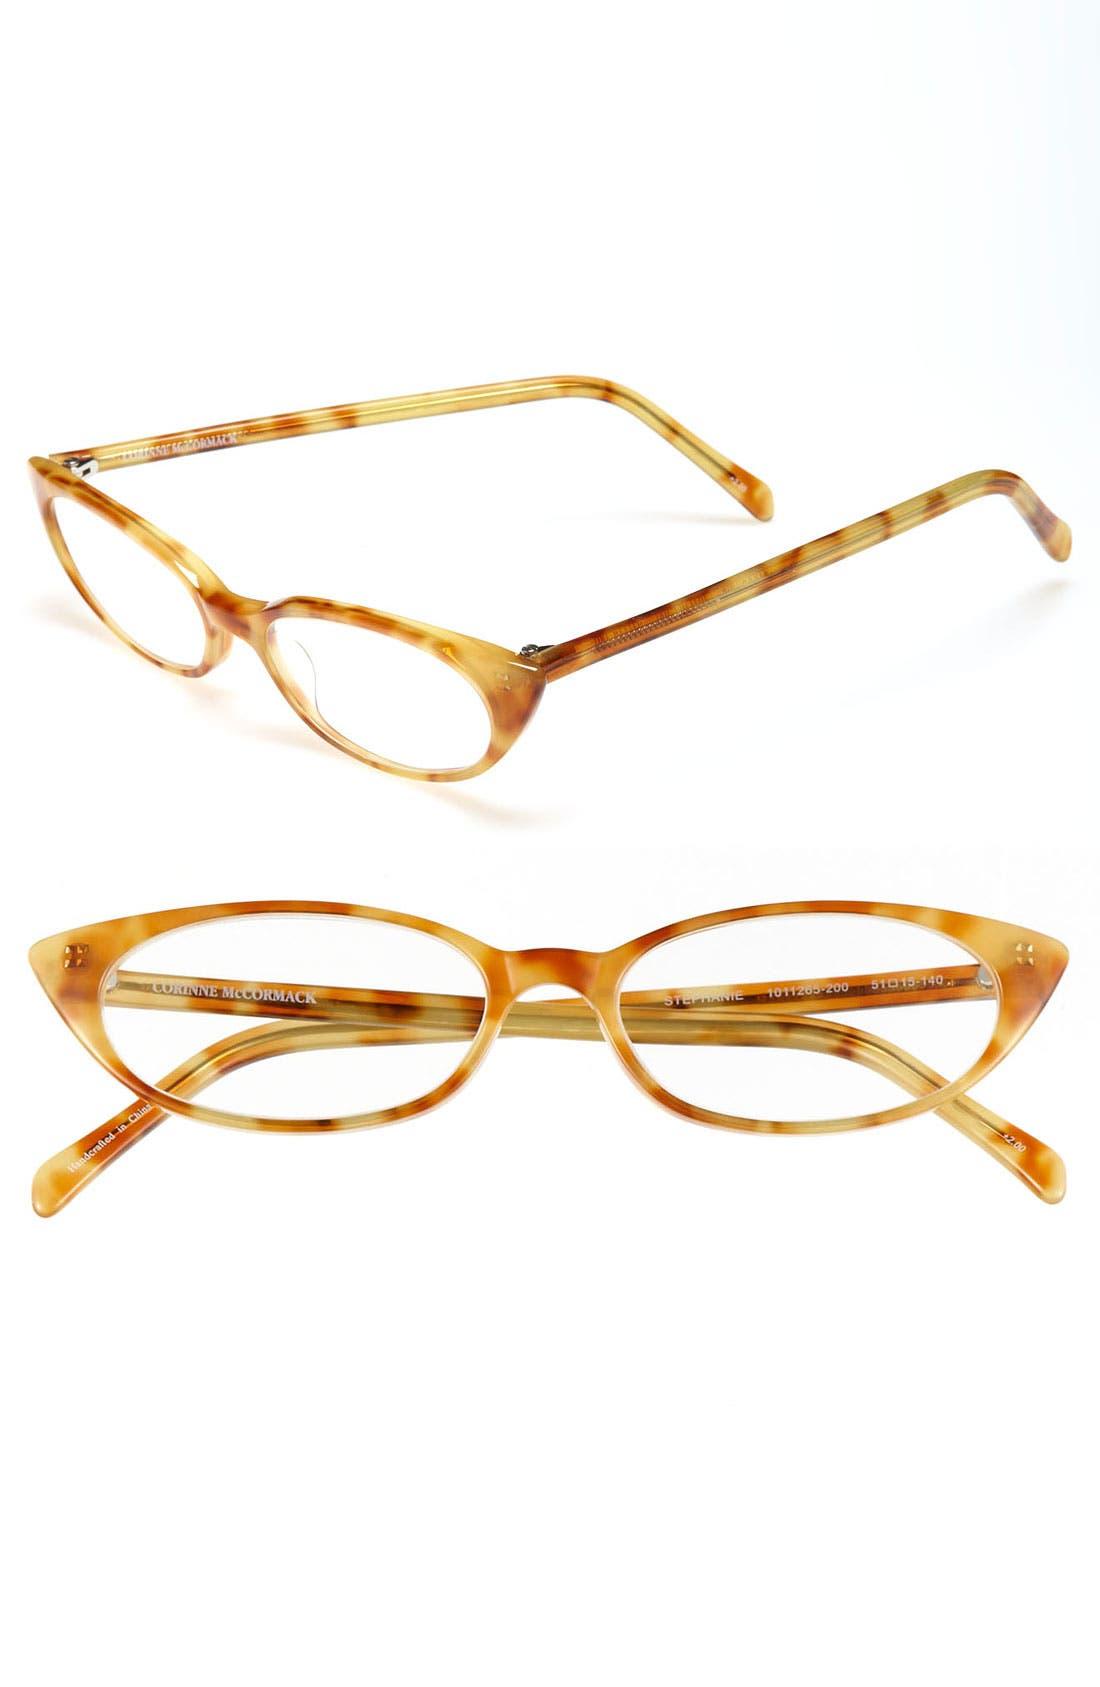 Main Image - Corinne McCormack 'Stephanie' 51mm Reading Glasses